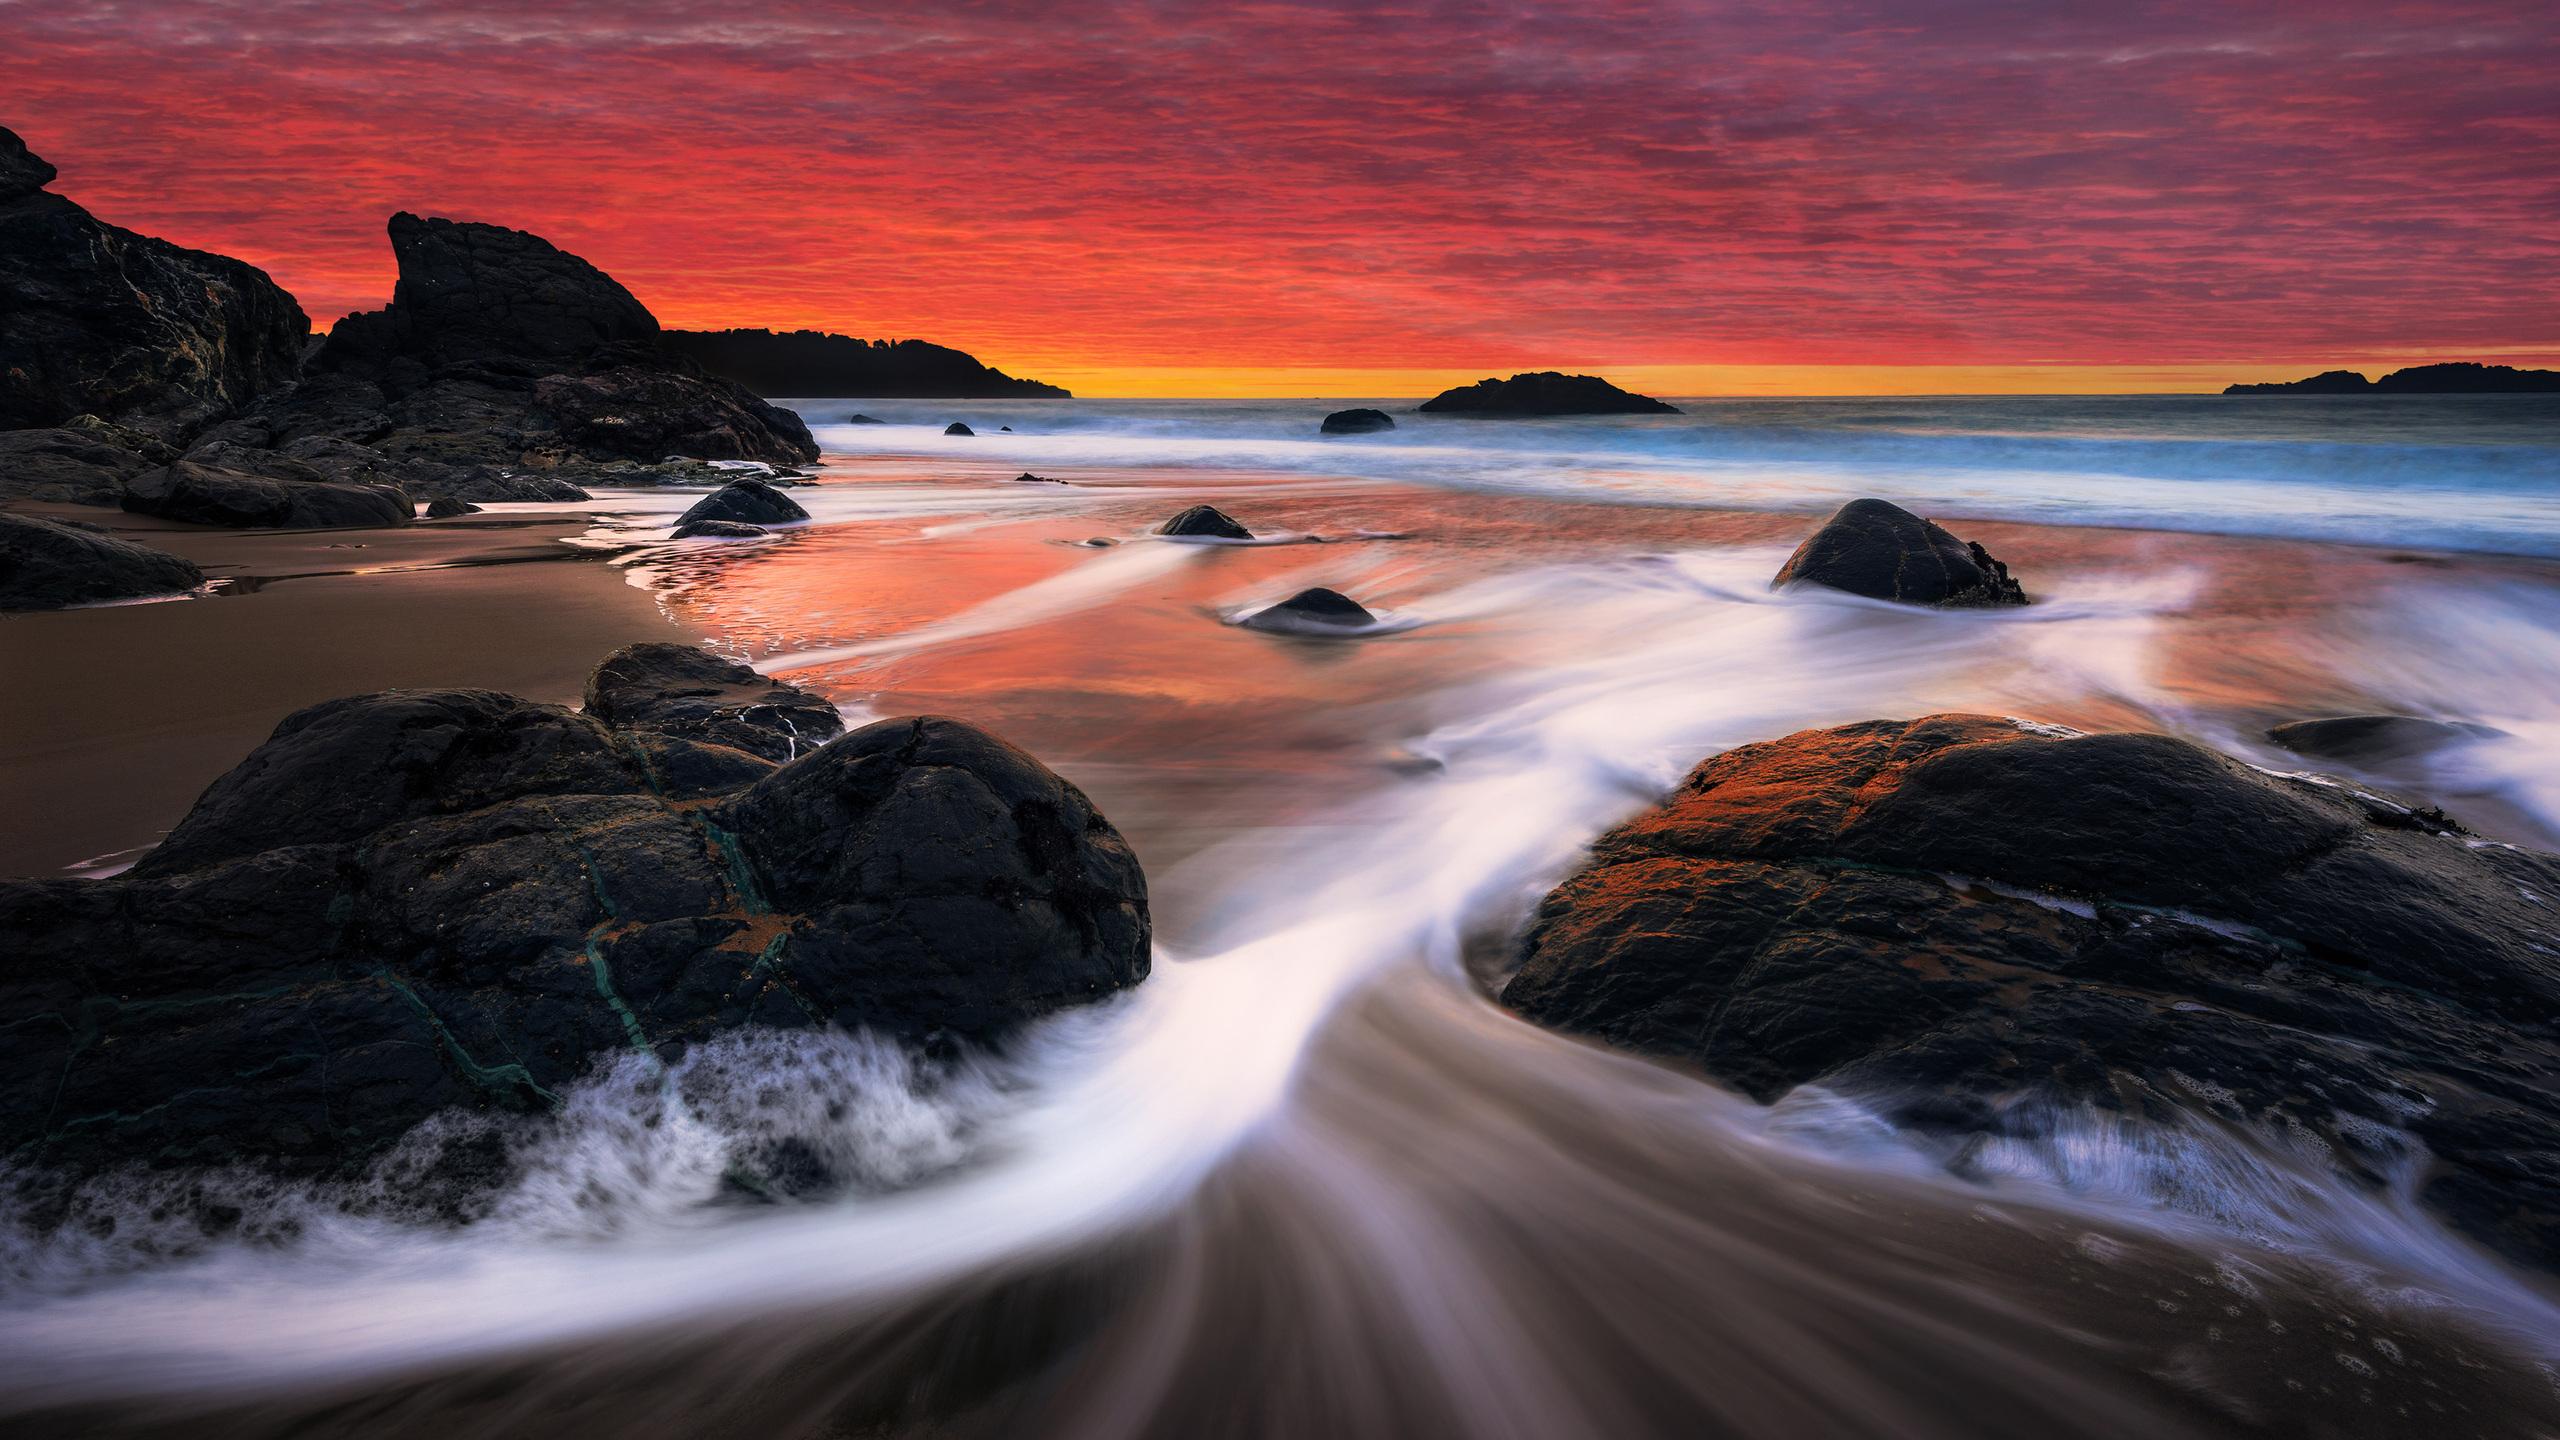 pink-sky-beach-waves-po.jpg